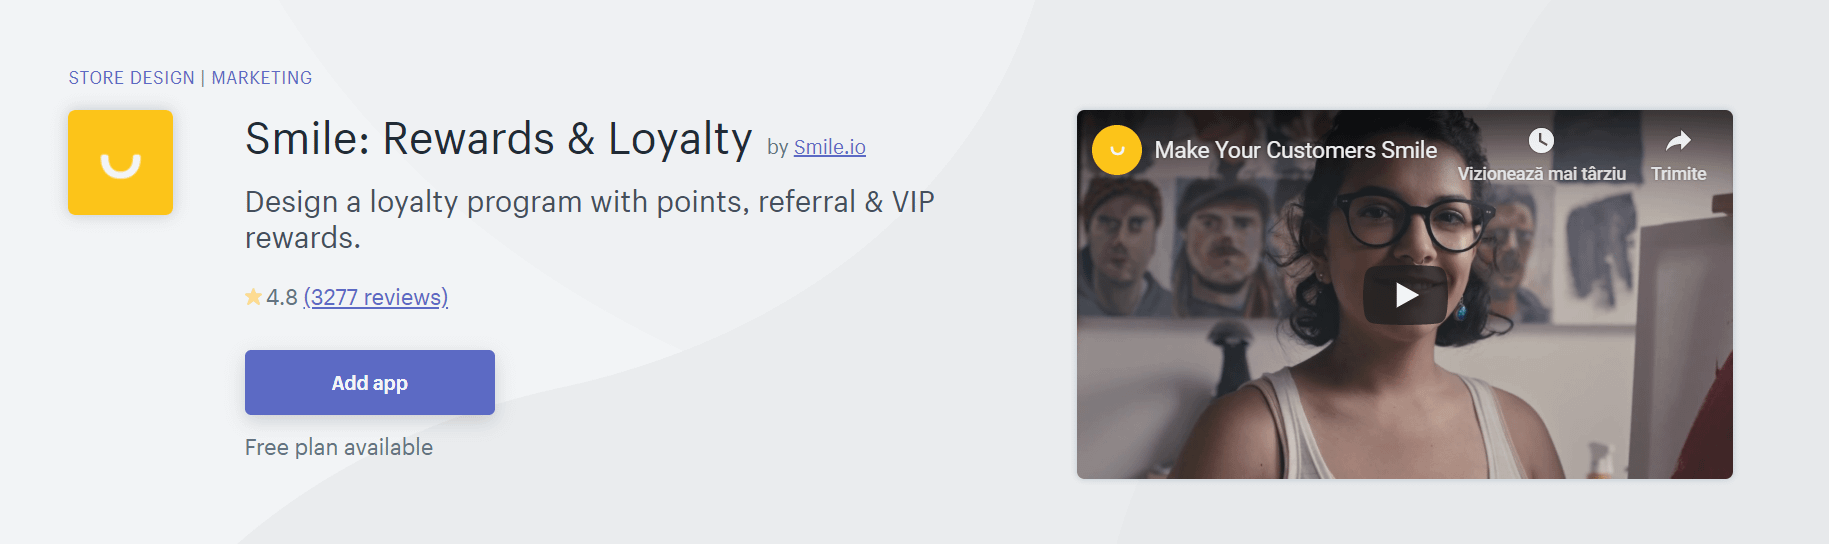 The Smile: Rewards & Loyalty app.